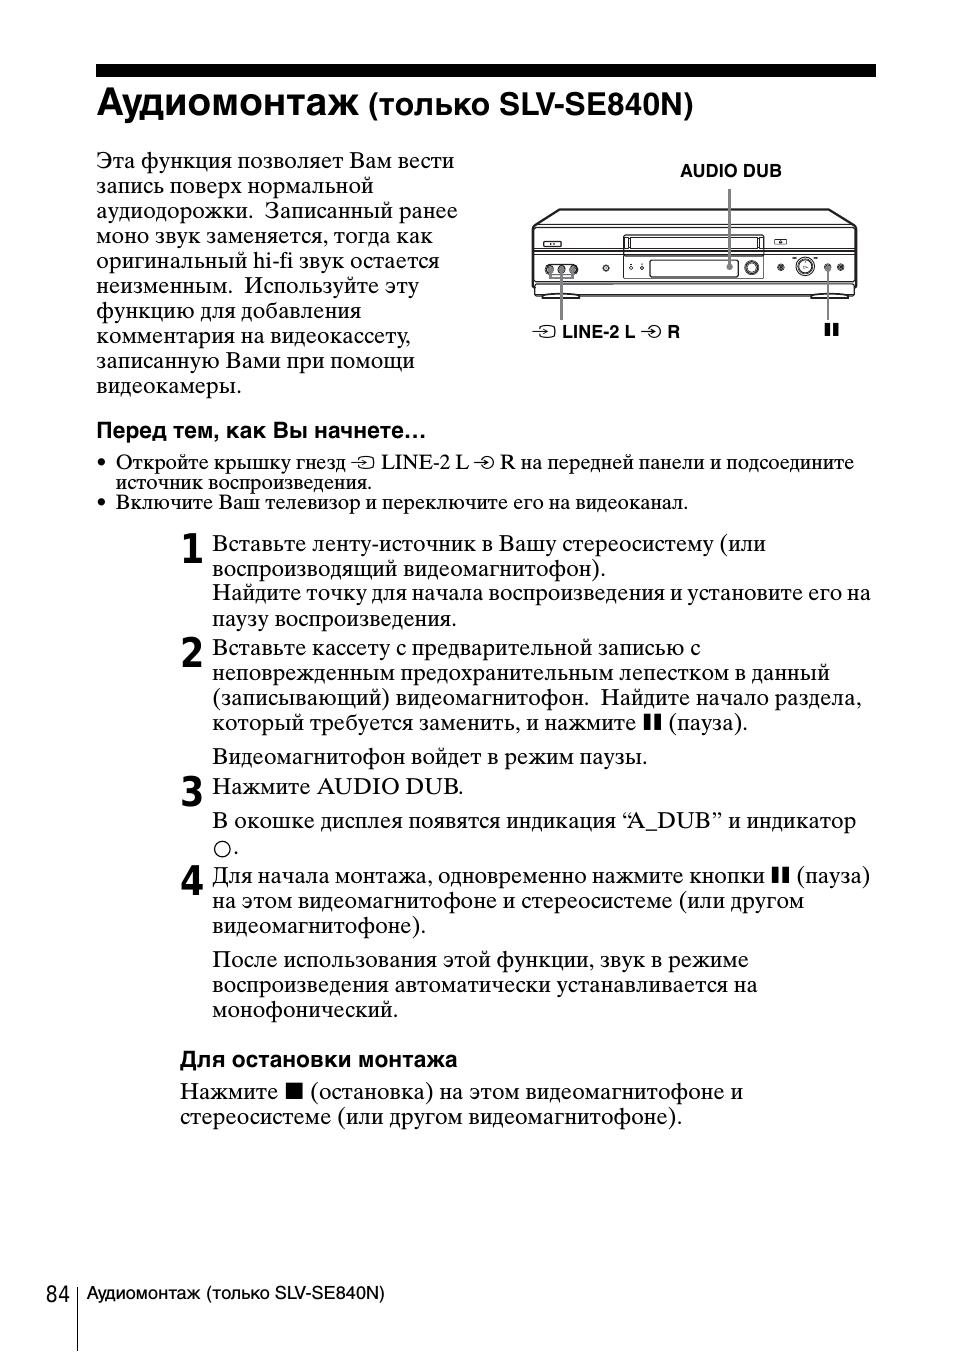 Аудиомонтаж (только slv-se840n), Аж) (84), Аудиомонтаж